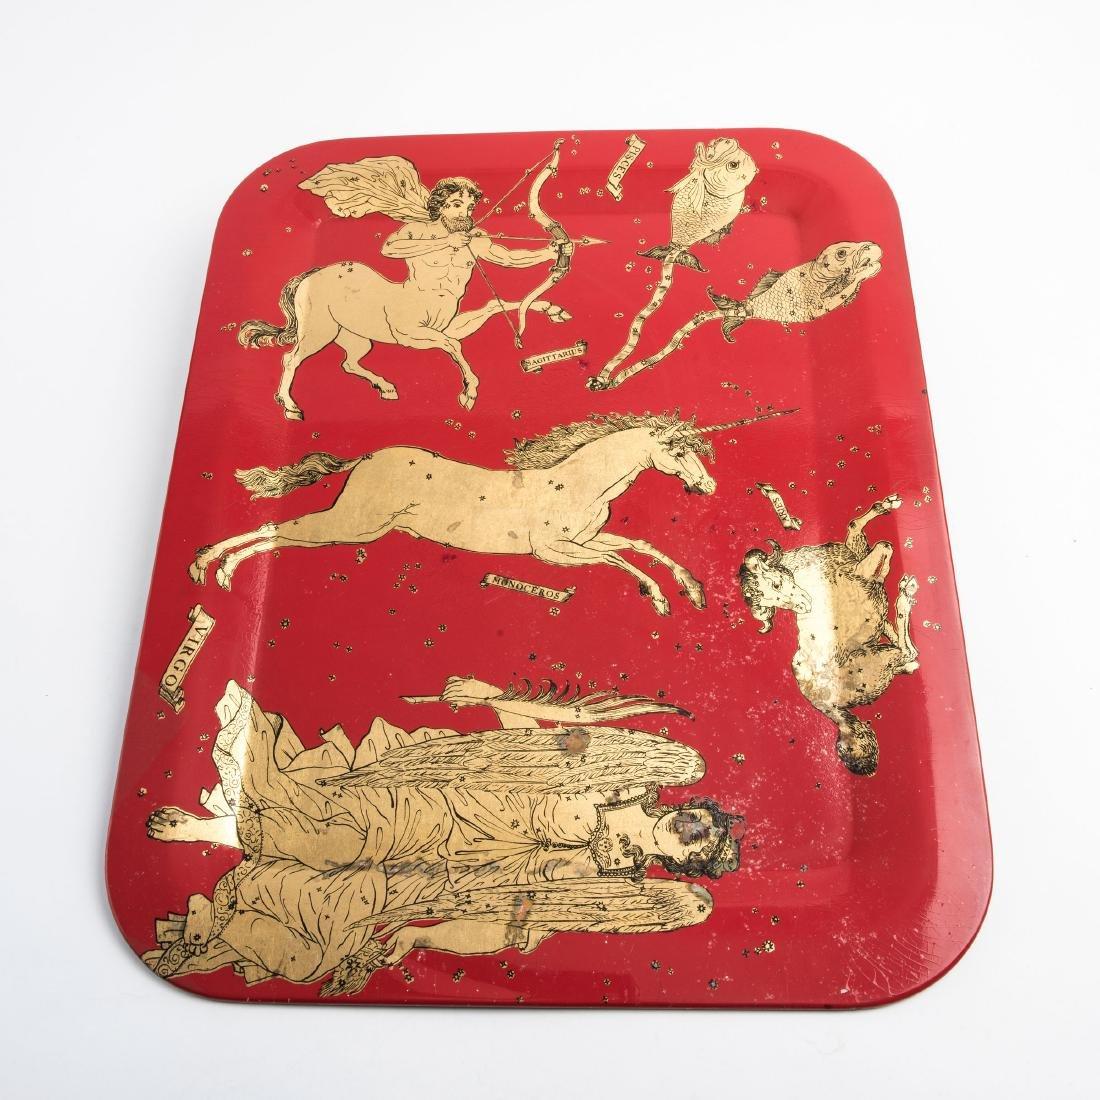 'Zodiaci' tray, 1950s - 2